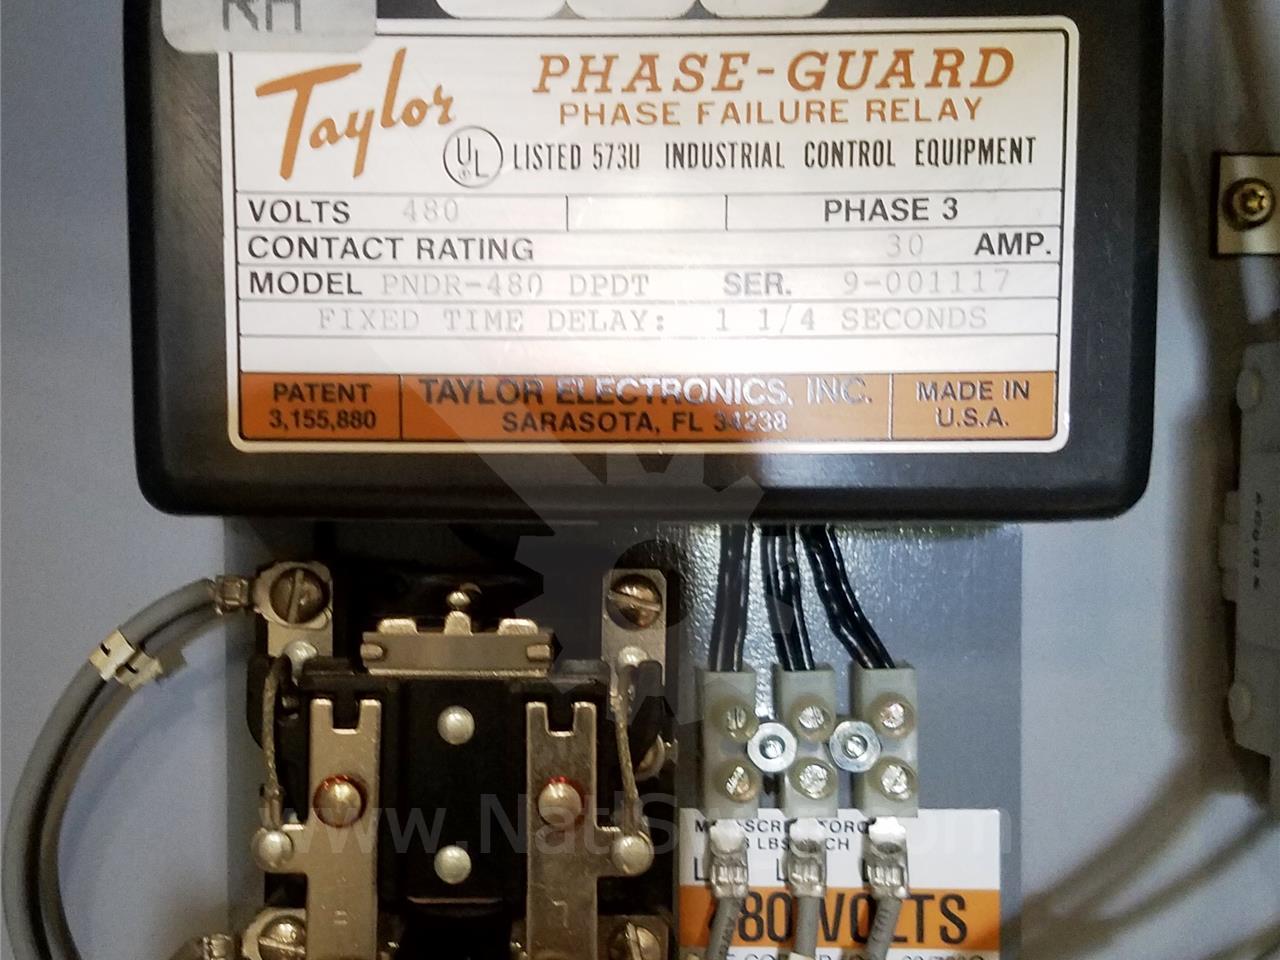 Pndr480 Taylor Electronics Phasegaurd Relay Sku015079 eBay